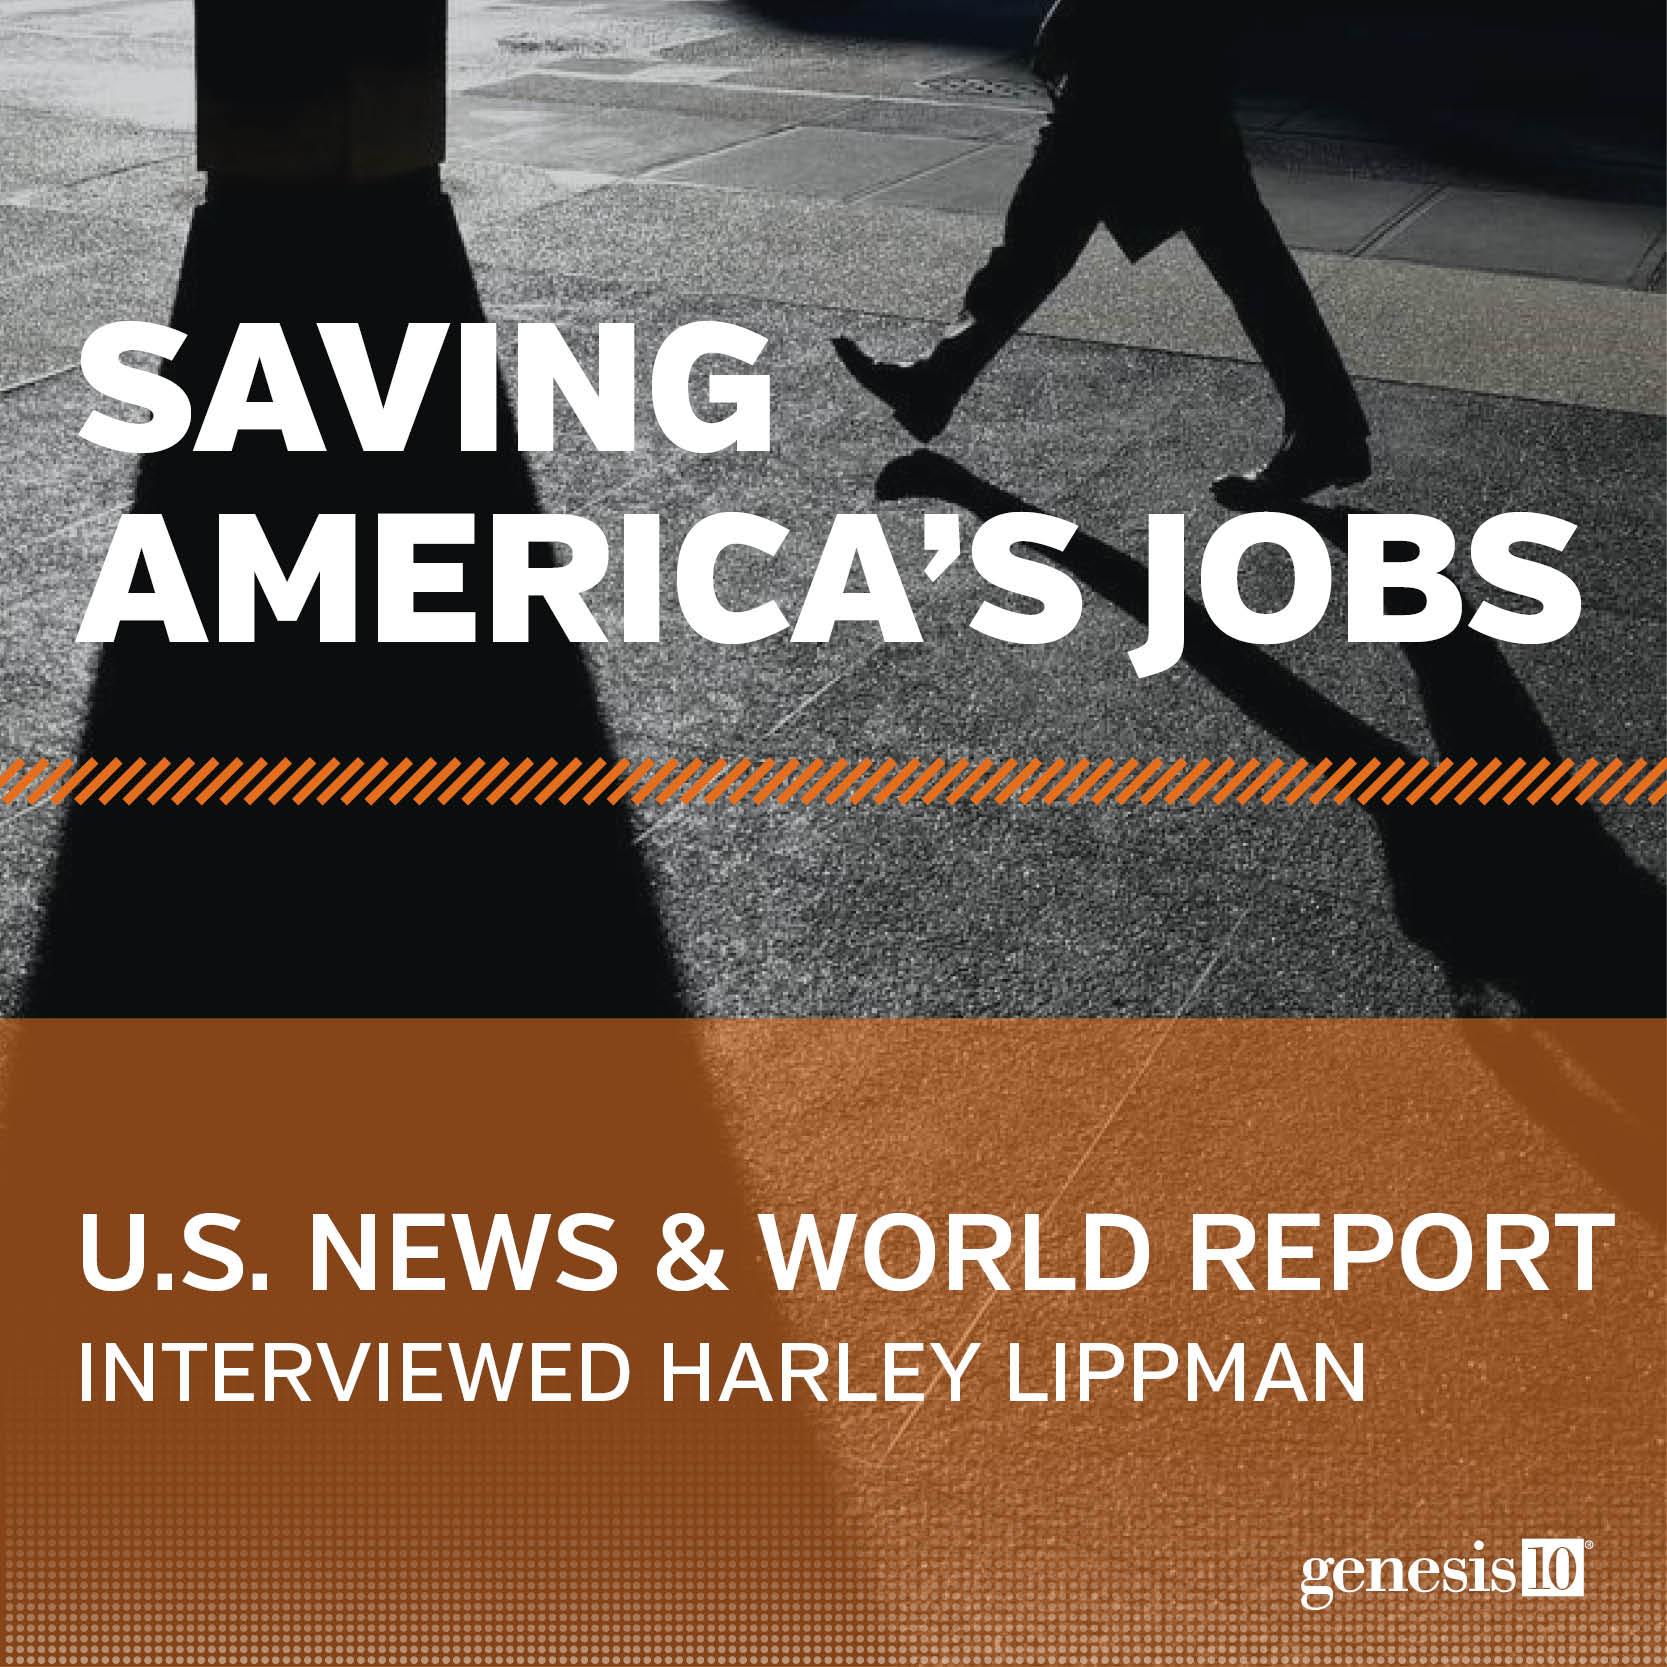 Saving America's Jobs - U.S. News & World Report, Interviewed Harley Lippman